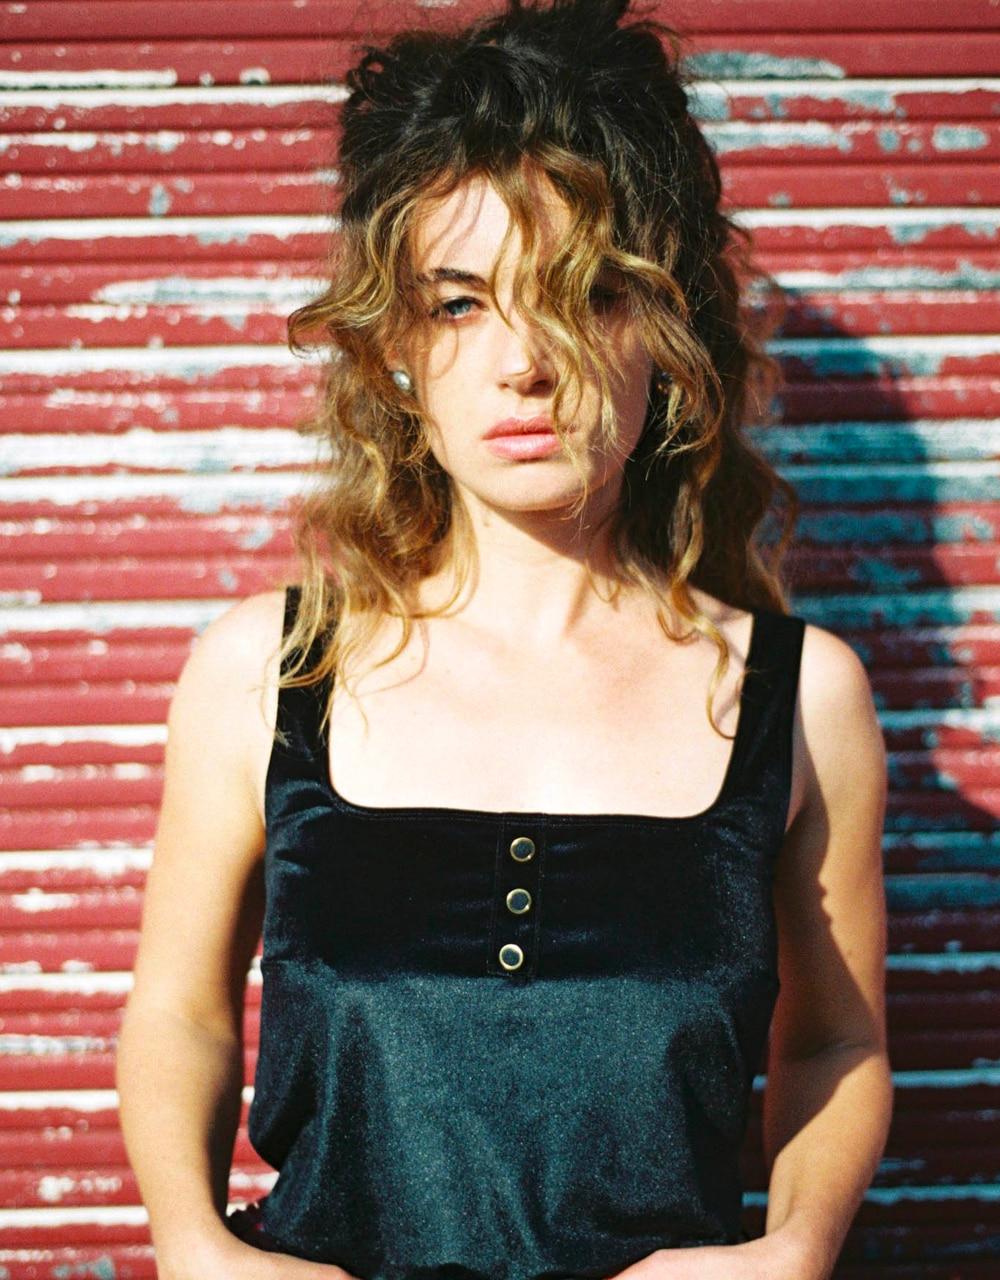 lingerie jumpsuit Charlie velvet Black Storm 59 € Girls In Paris photo 4